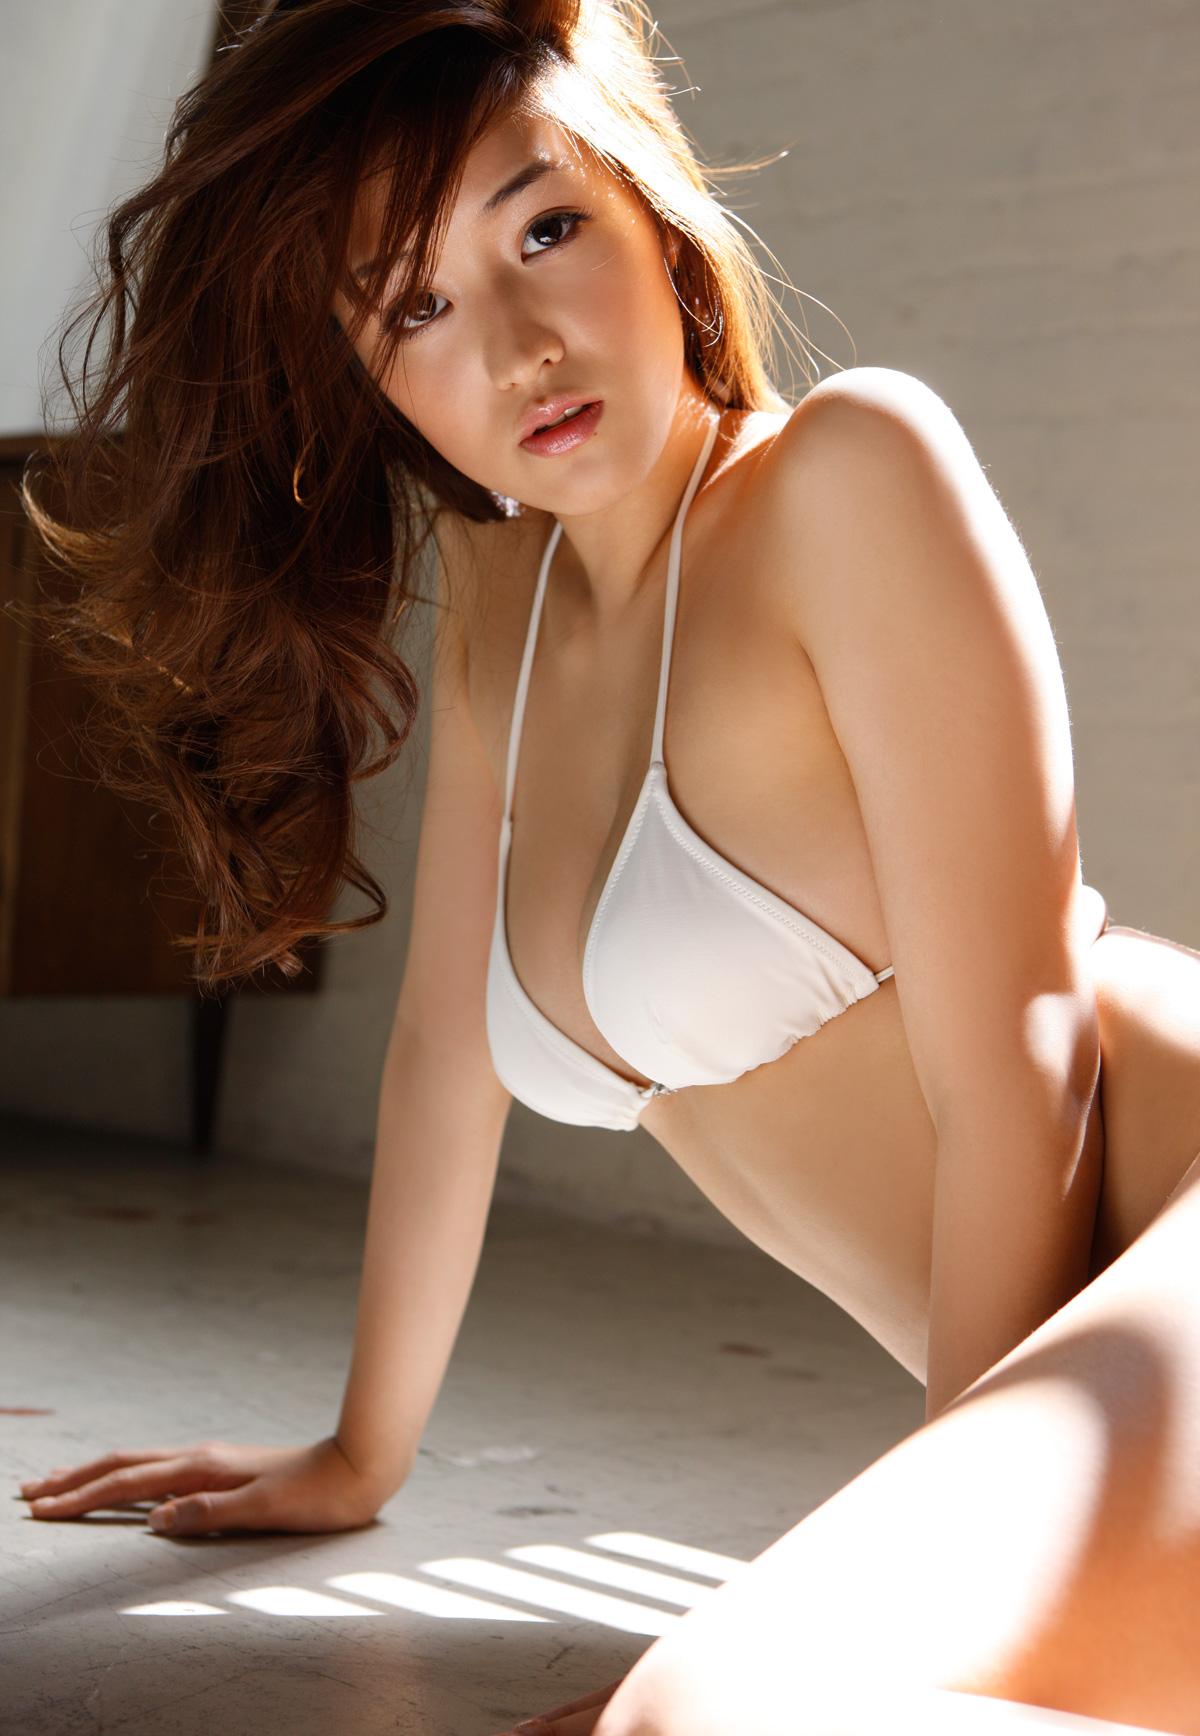 Rin kajika japanese big boob - 5 5